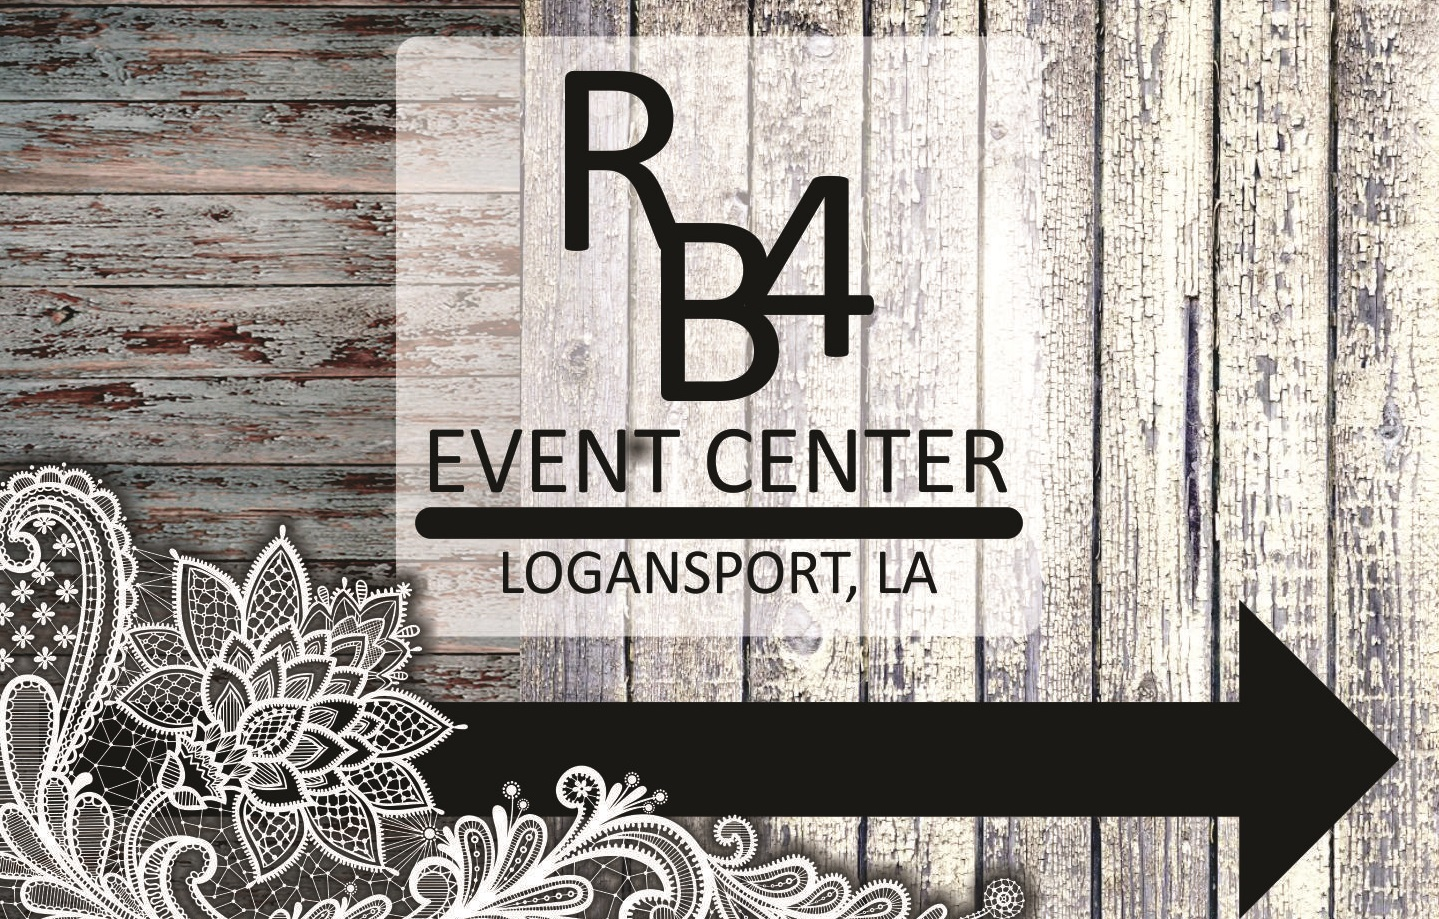 RB4 Wedding & Event Center in DeSoto Parish